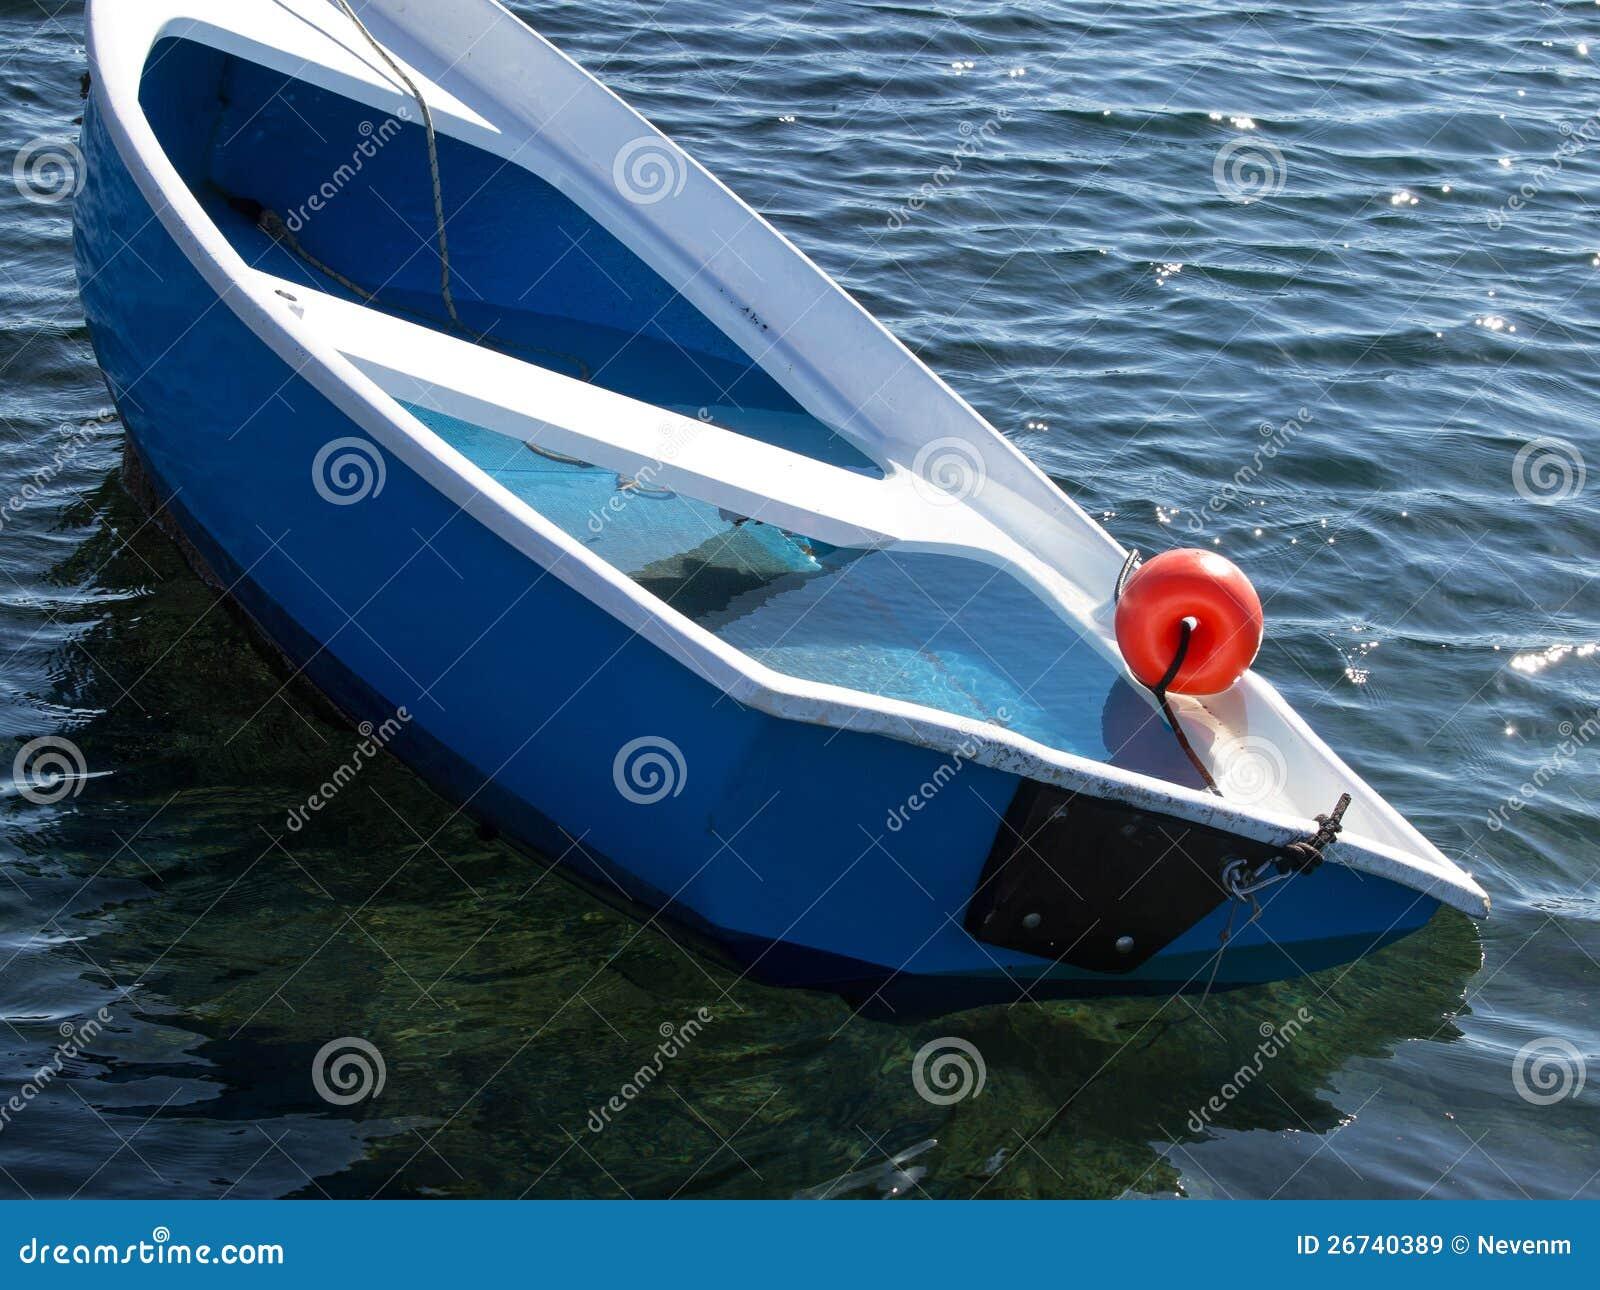 Sinking Boat Royalty Free Stock Images - Image: 26740389